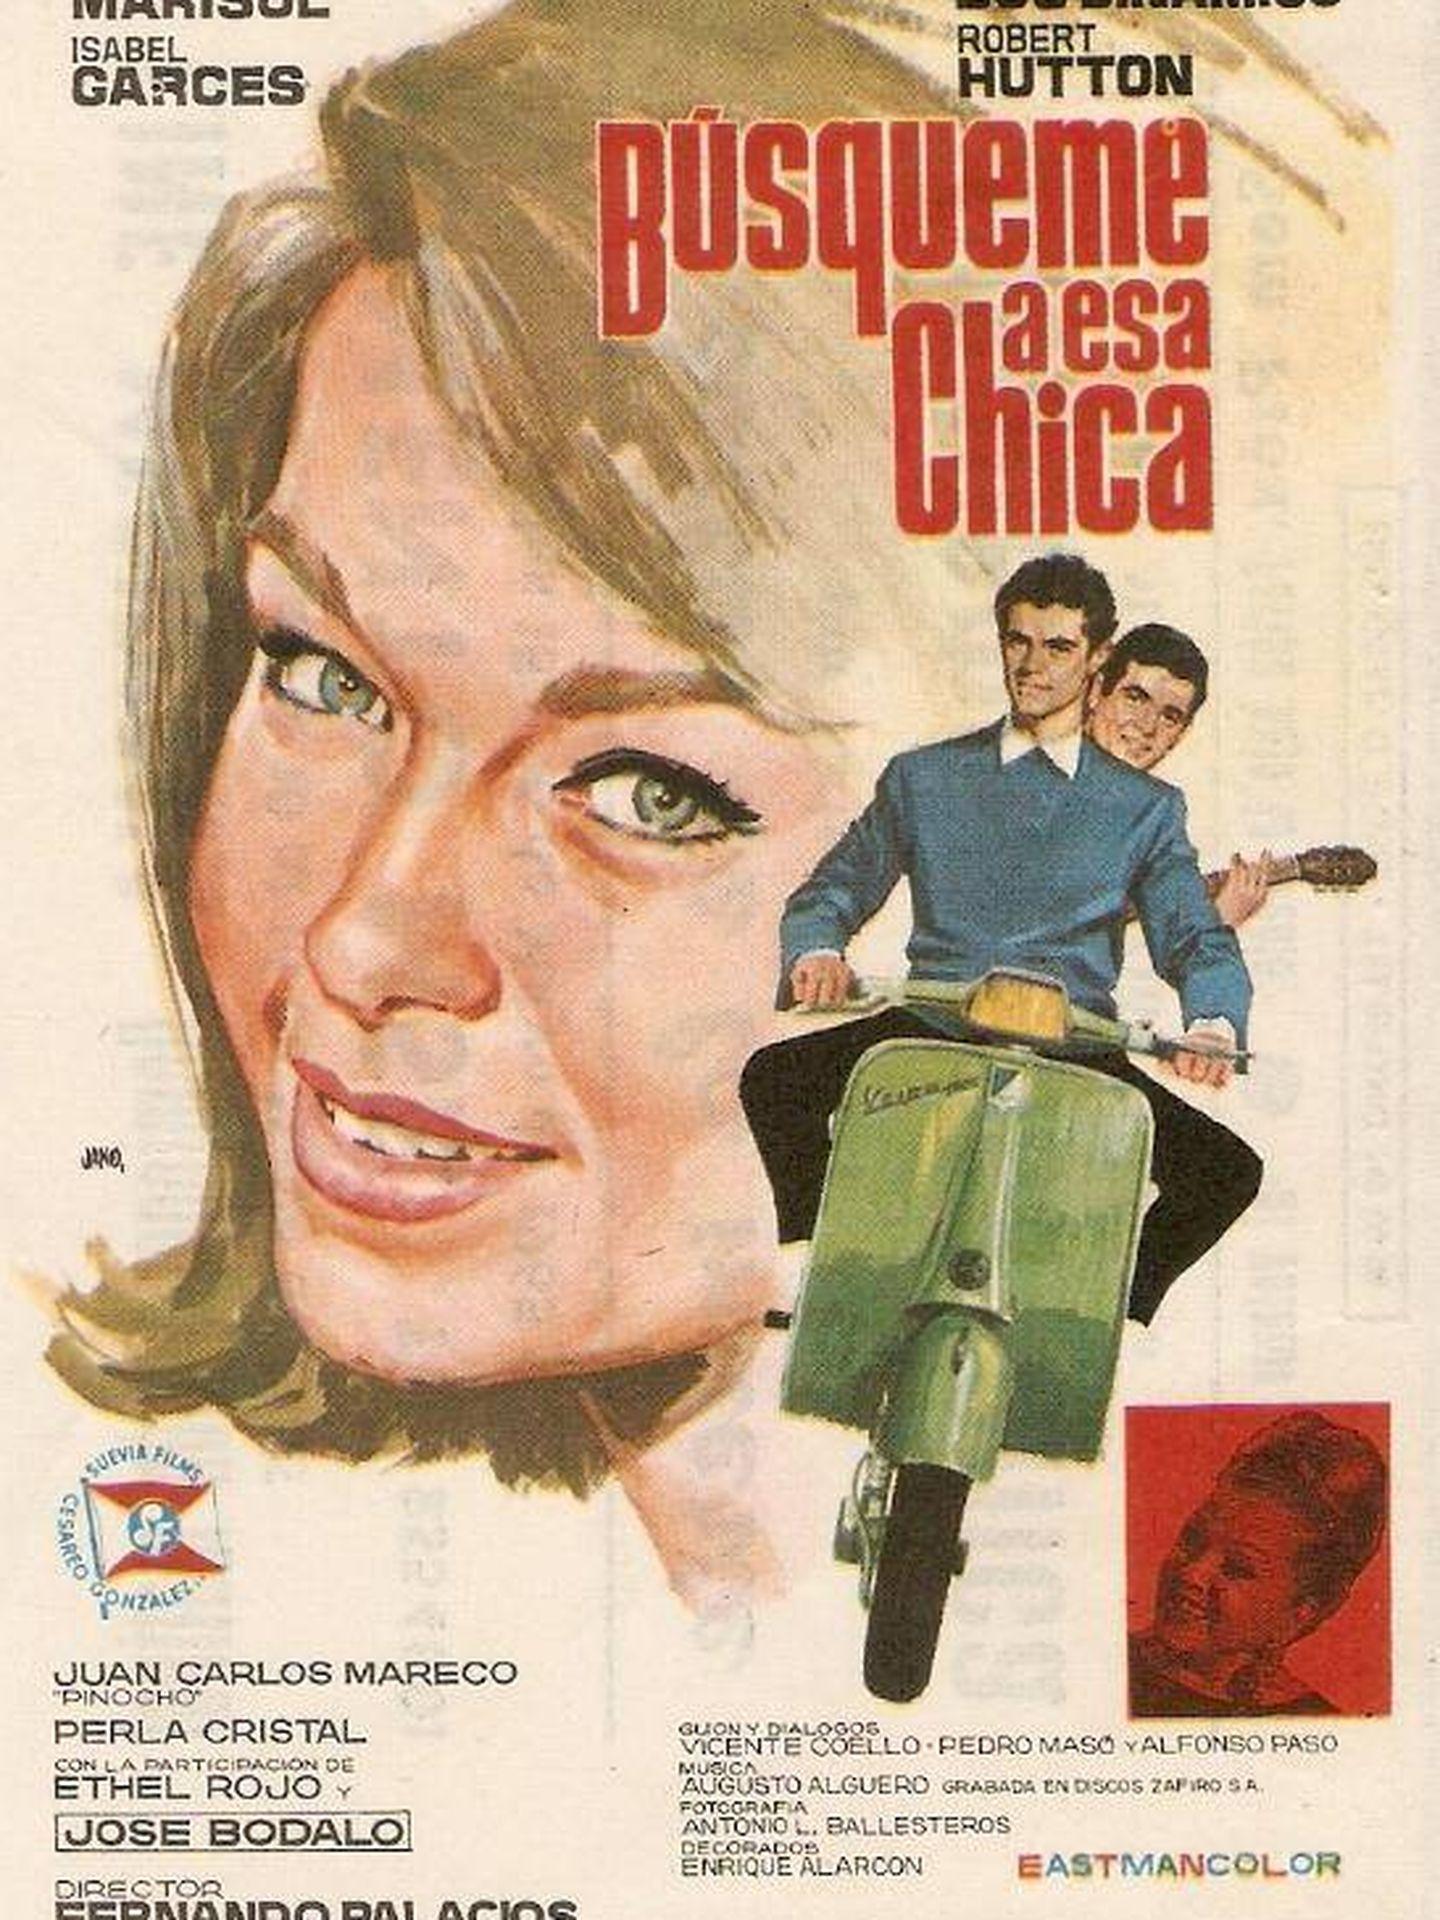 Cartel promocional de la película 'Búsqueme a esa chica'.